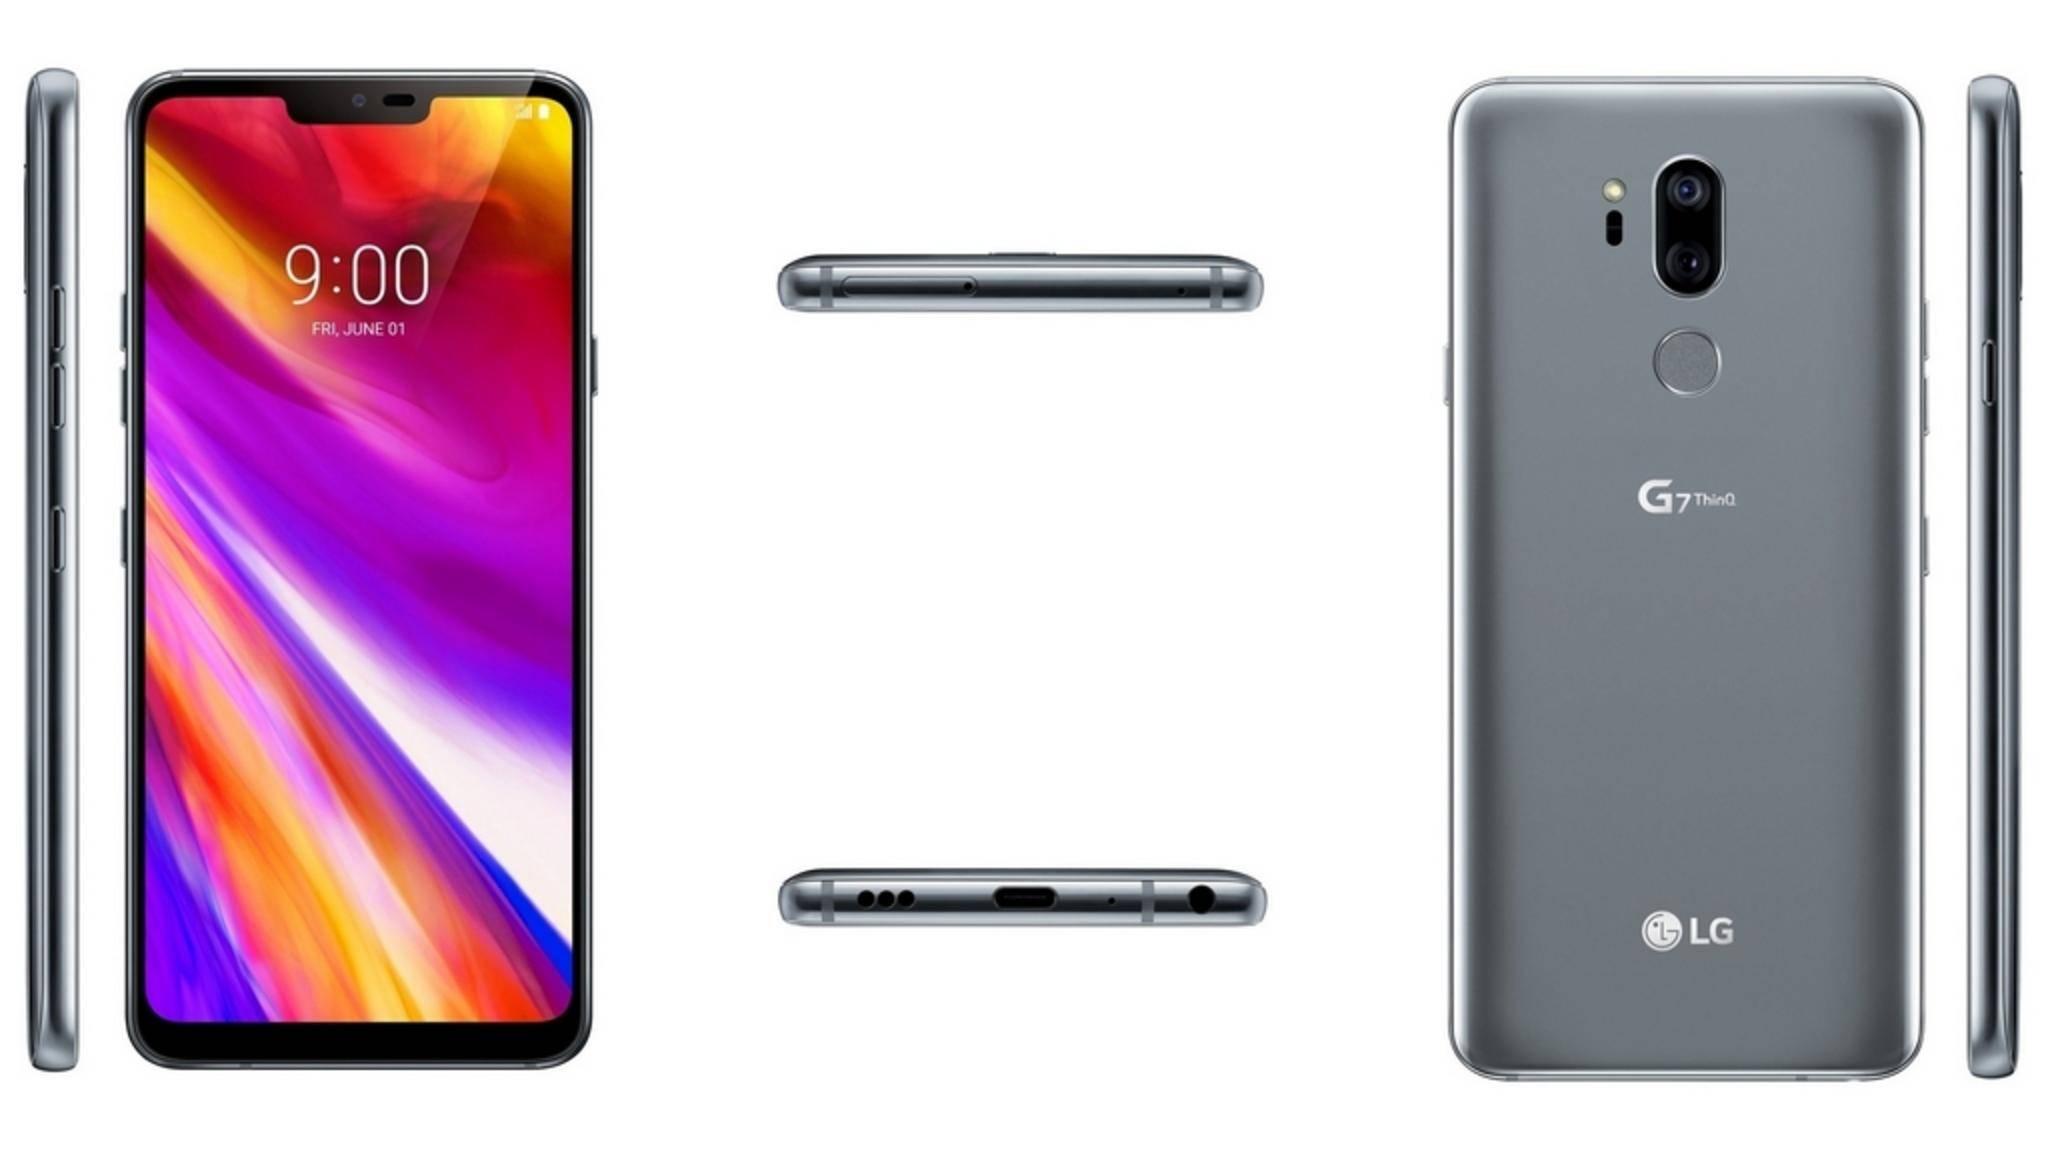 Noch randloser als das LG G6: Das LG V30 ThinQ wird Anfang Mai vorgestellt.